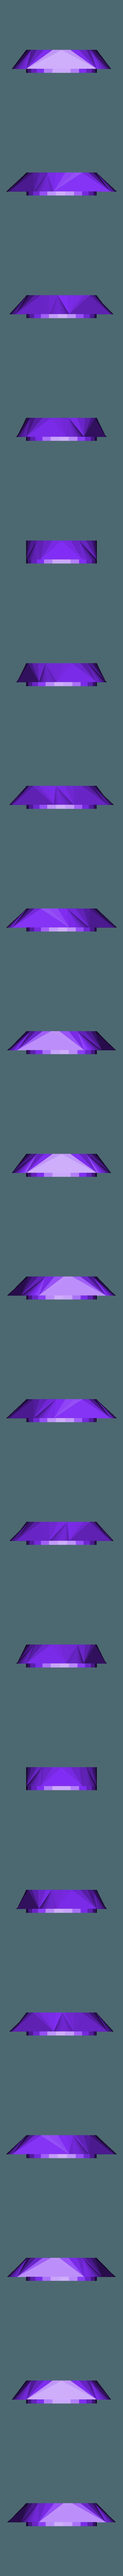 Lens_Hood_V2.stl Download free STL file Not a LAMP - It is not a lamp - Camera lamp • 3D printing model, Gonzalor